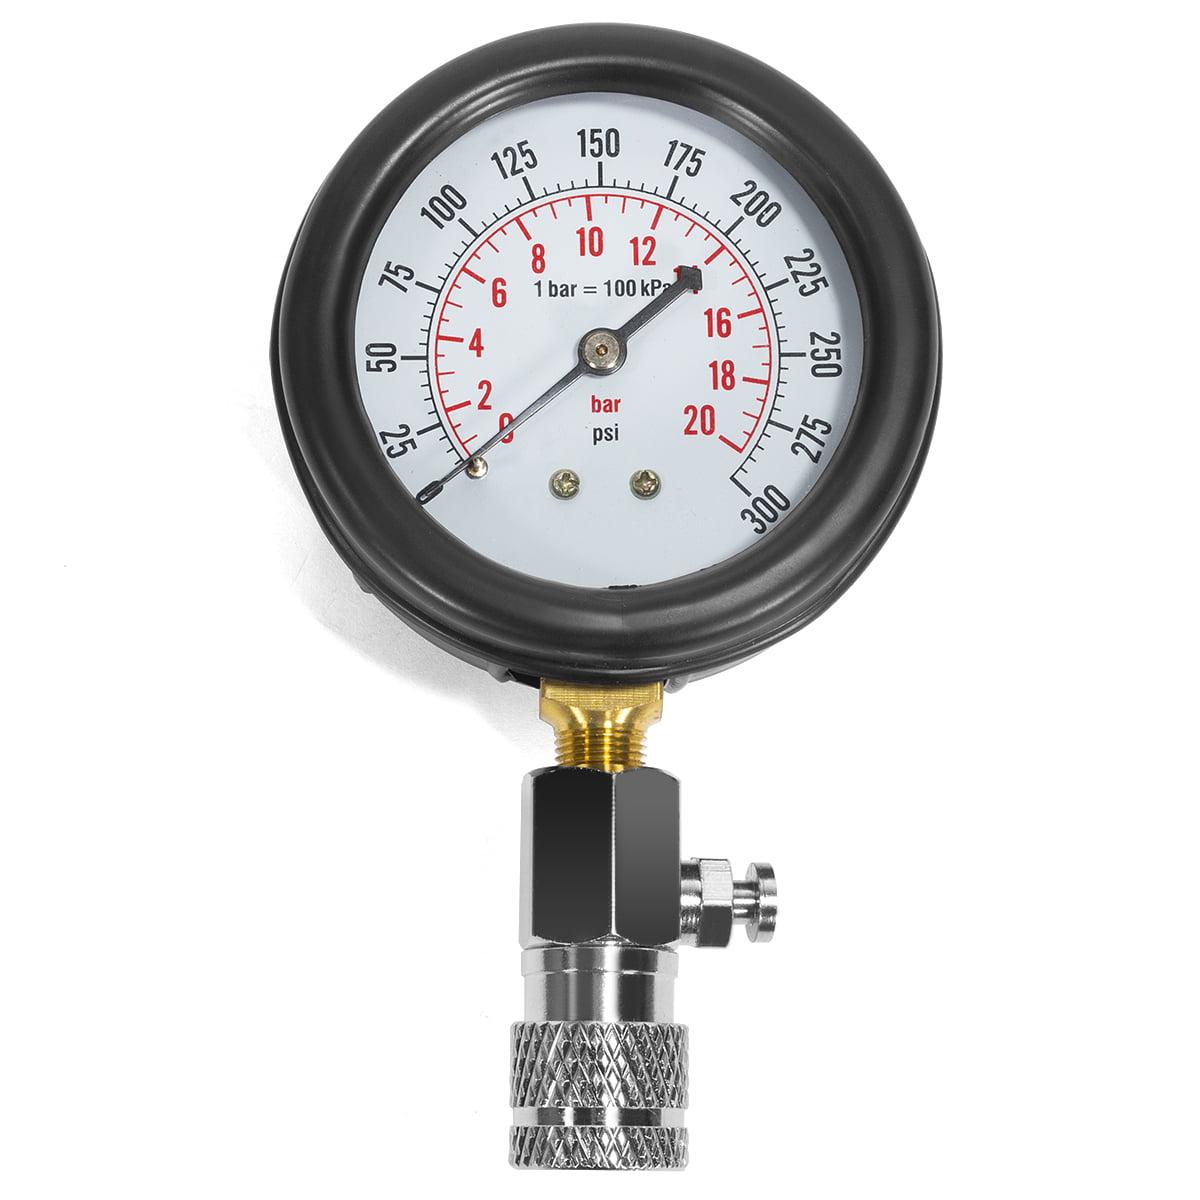 8 Pcs Petrol Engine Compression Cylinder Pressure Tester Gauge M10 M12 M14 M18 Auto Truck Car 0-300 psi